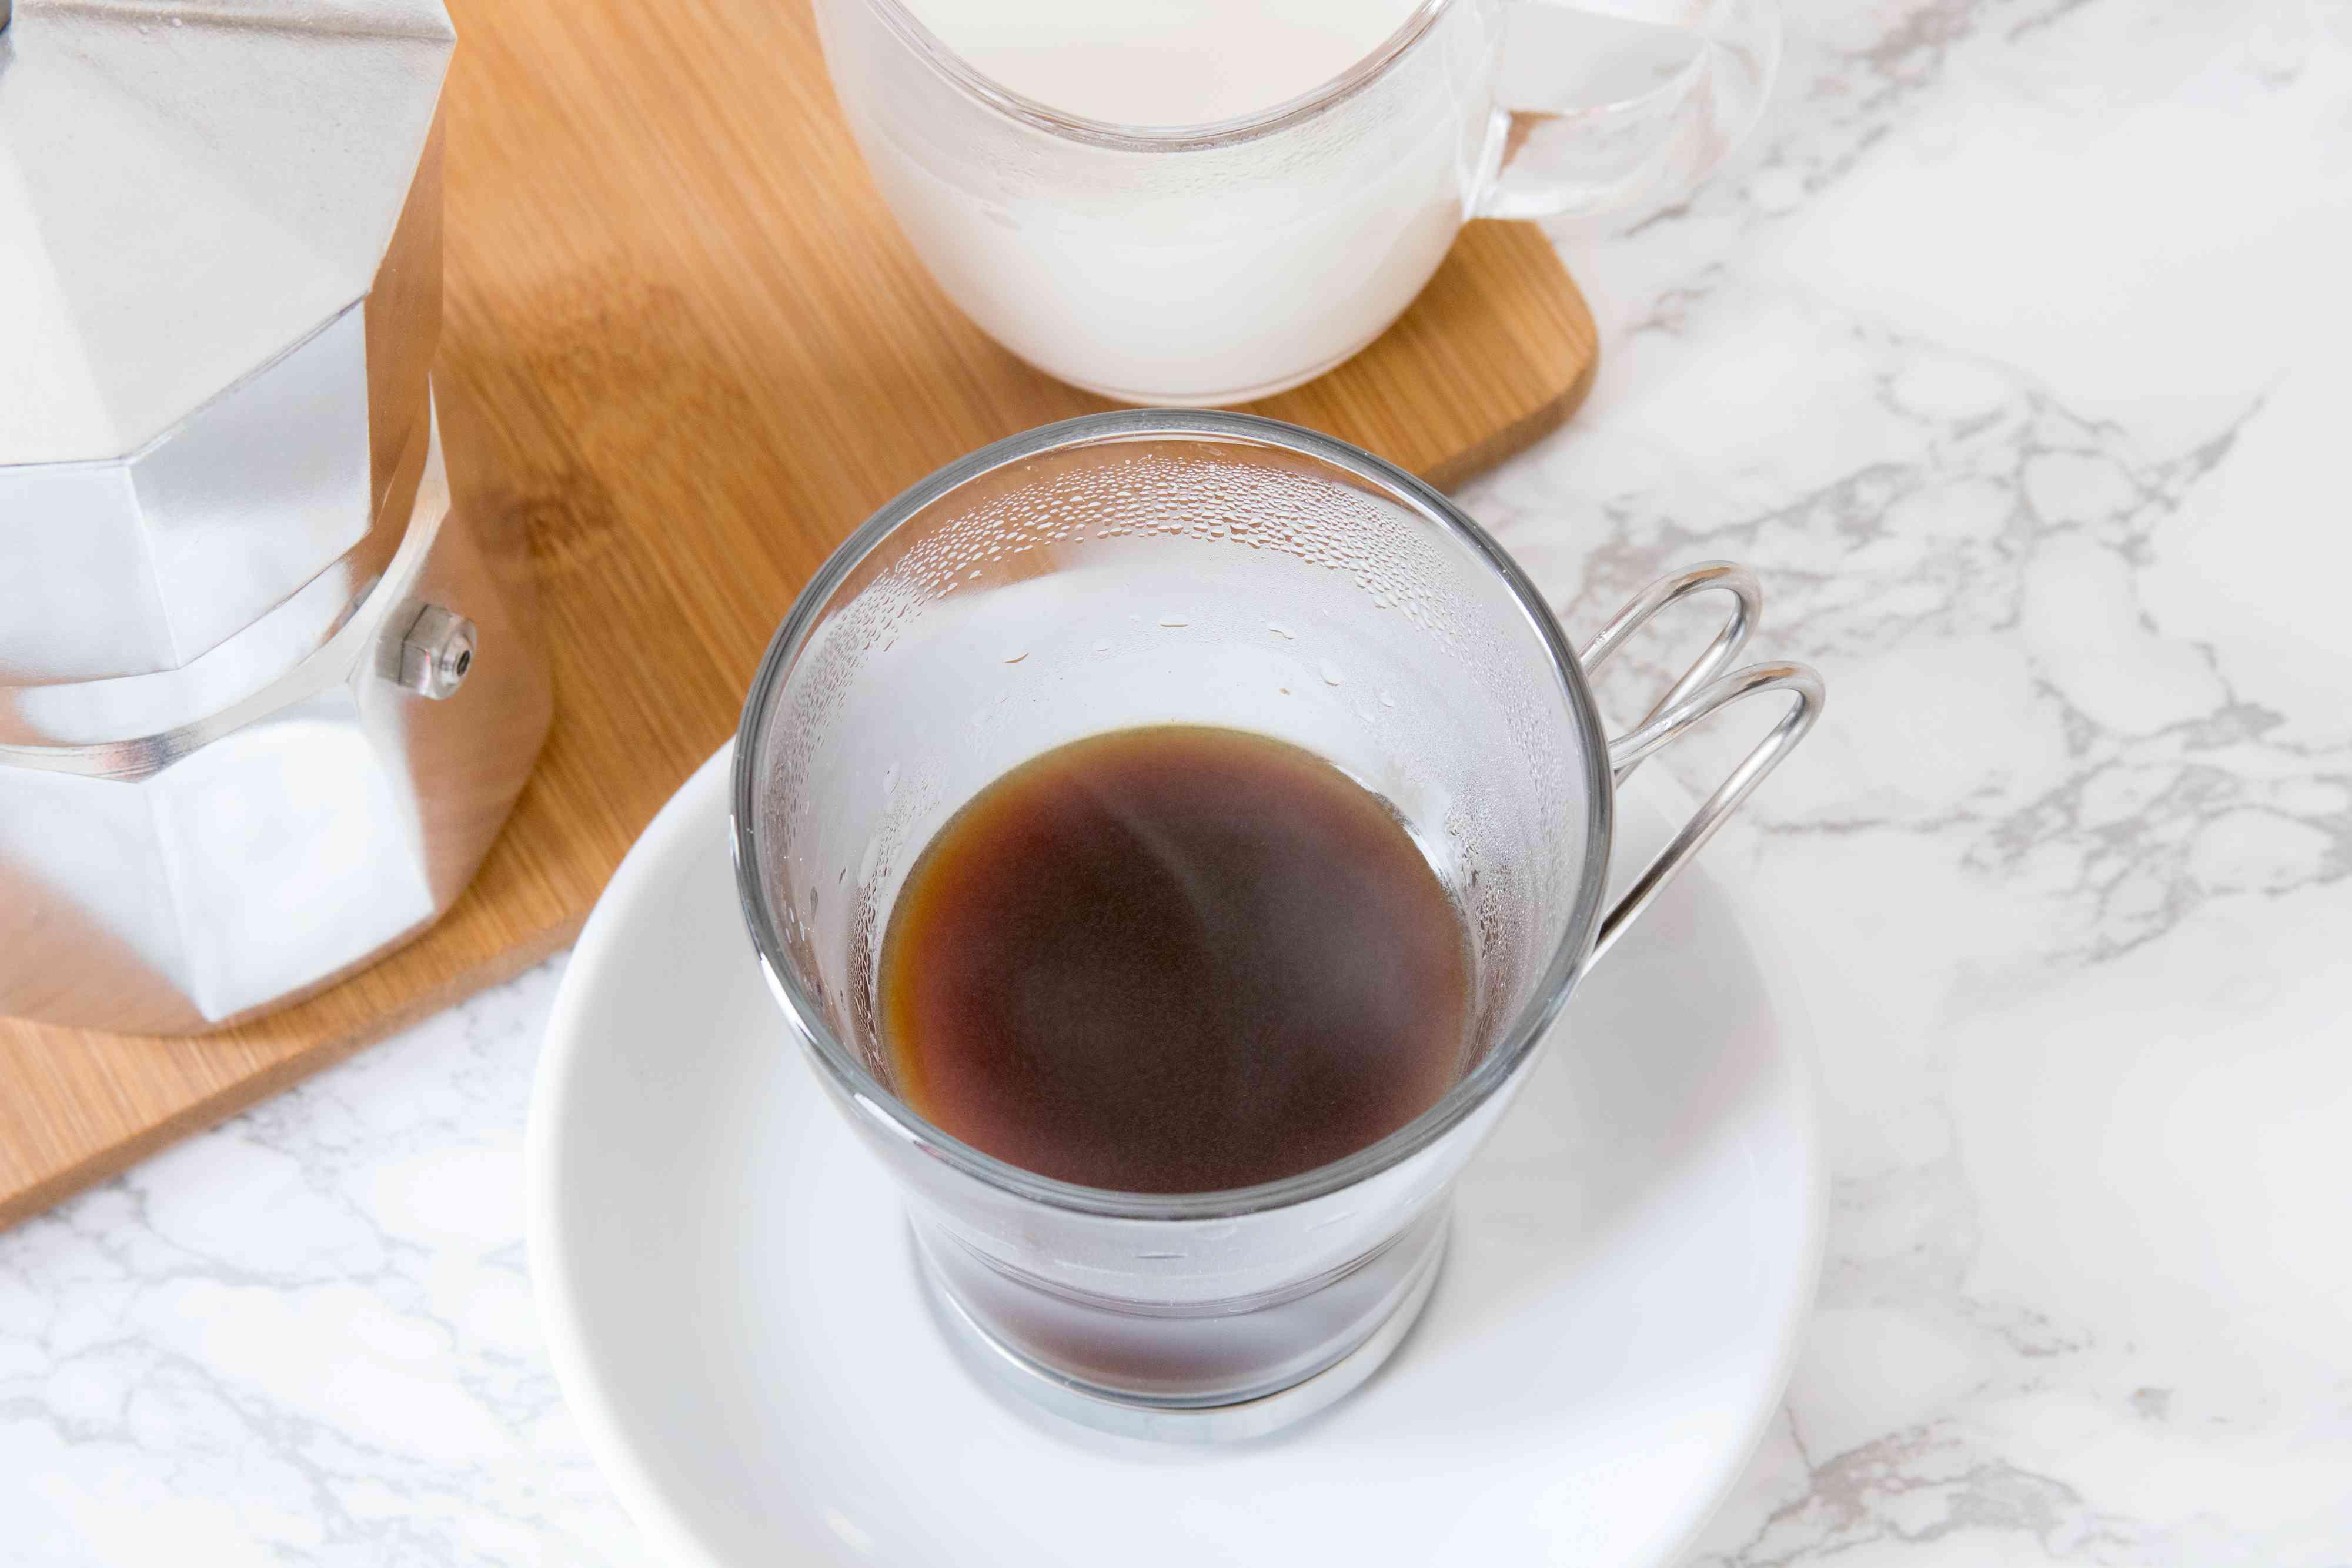 Making Cafe con Leche With Fresh Espresso